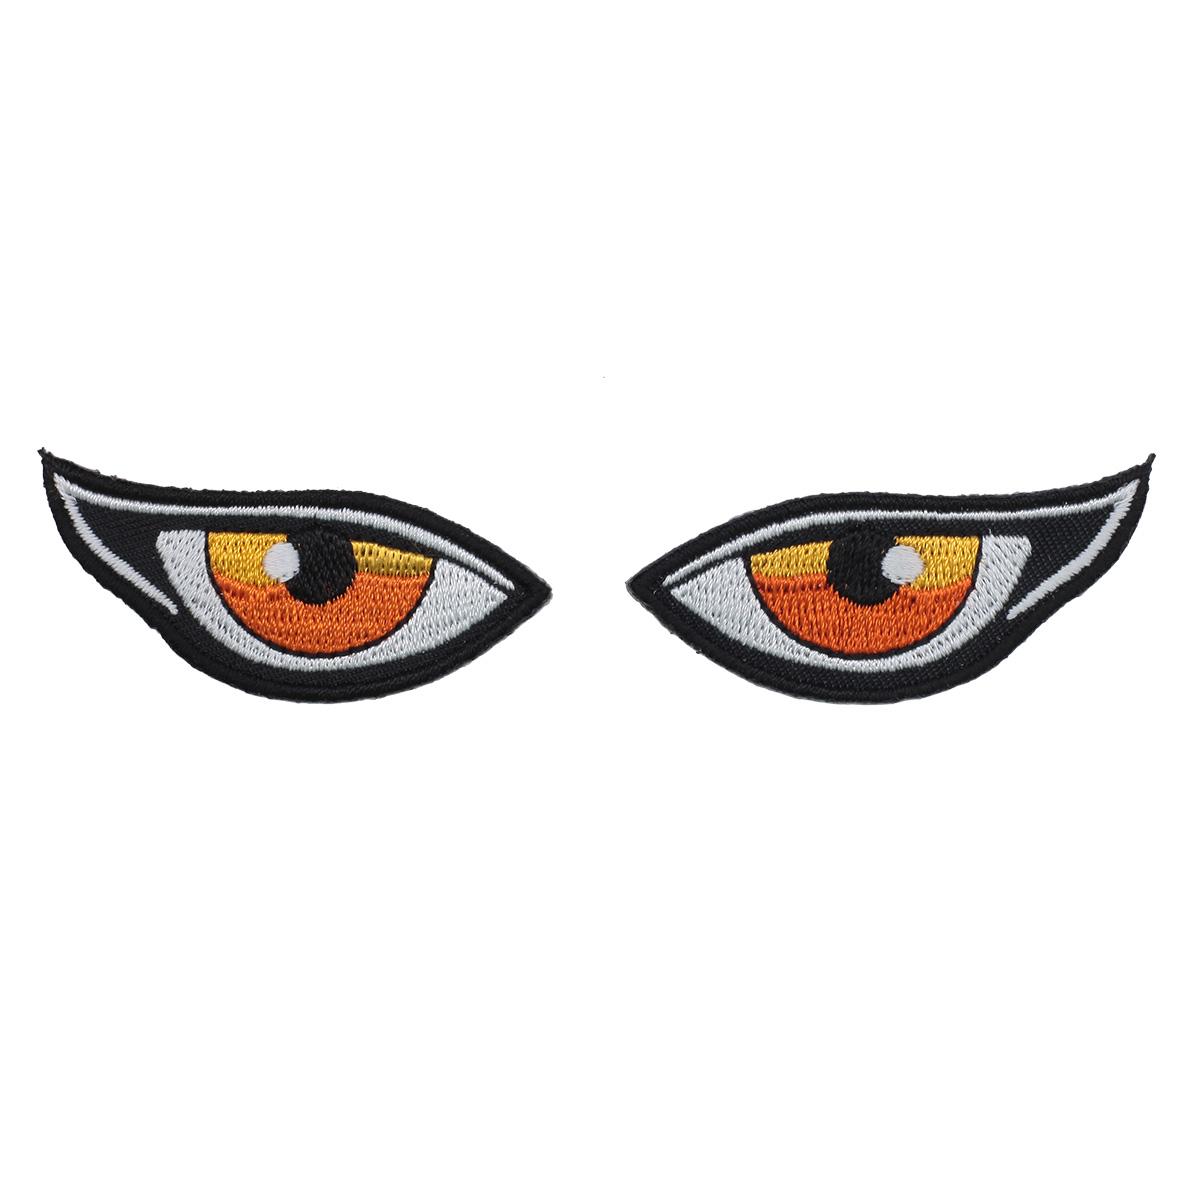 Термоаппликация 'Глаза желтые' 3*10см Hobby&Pro